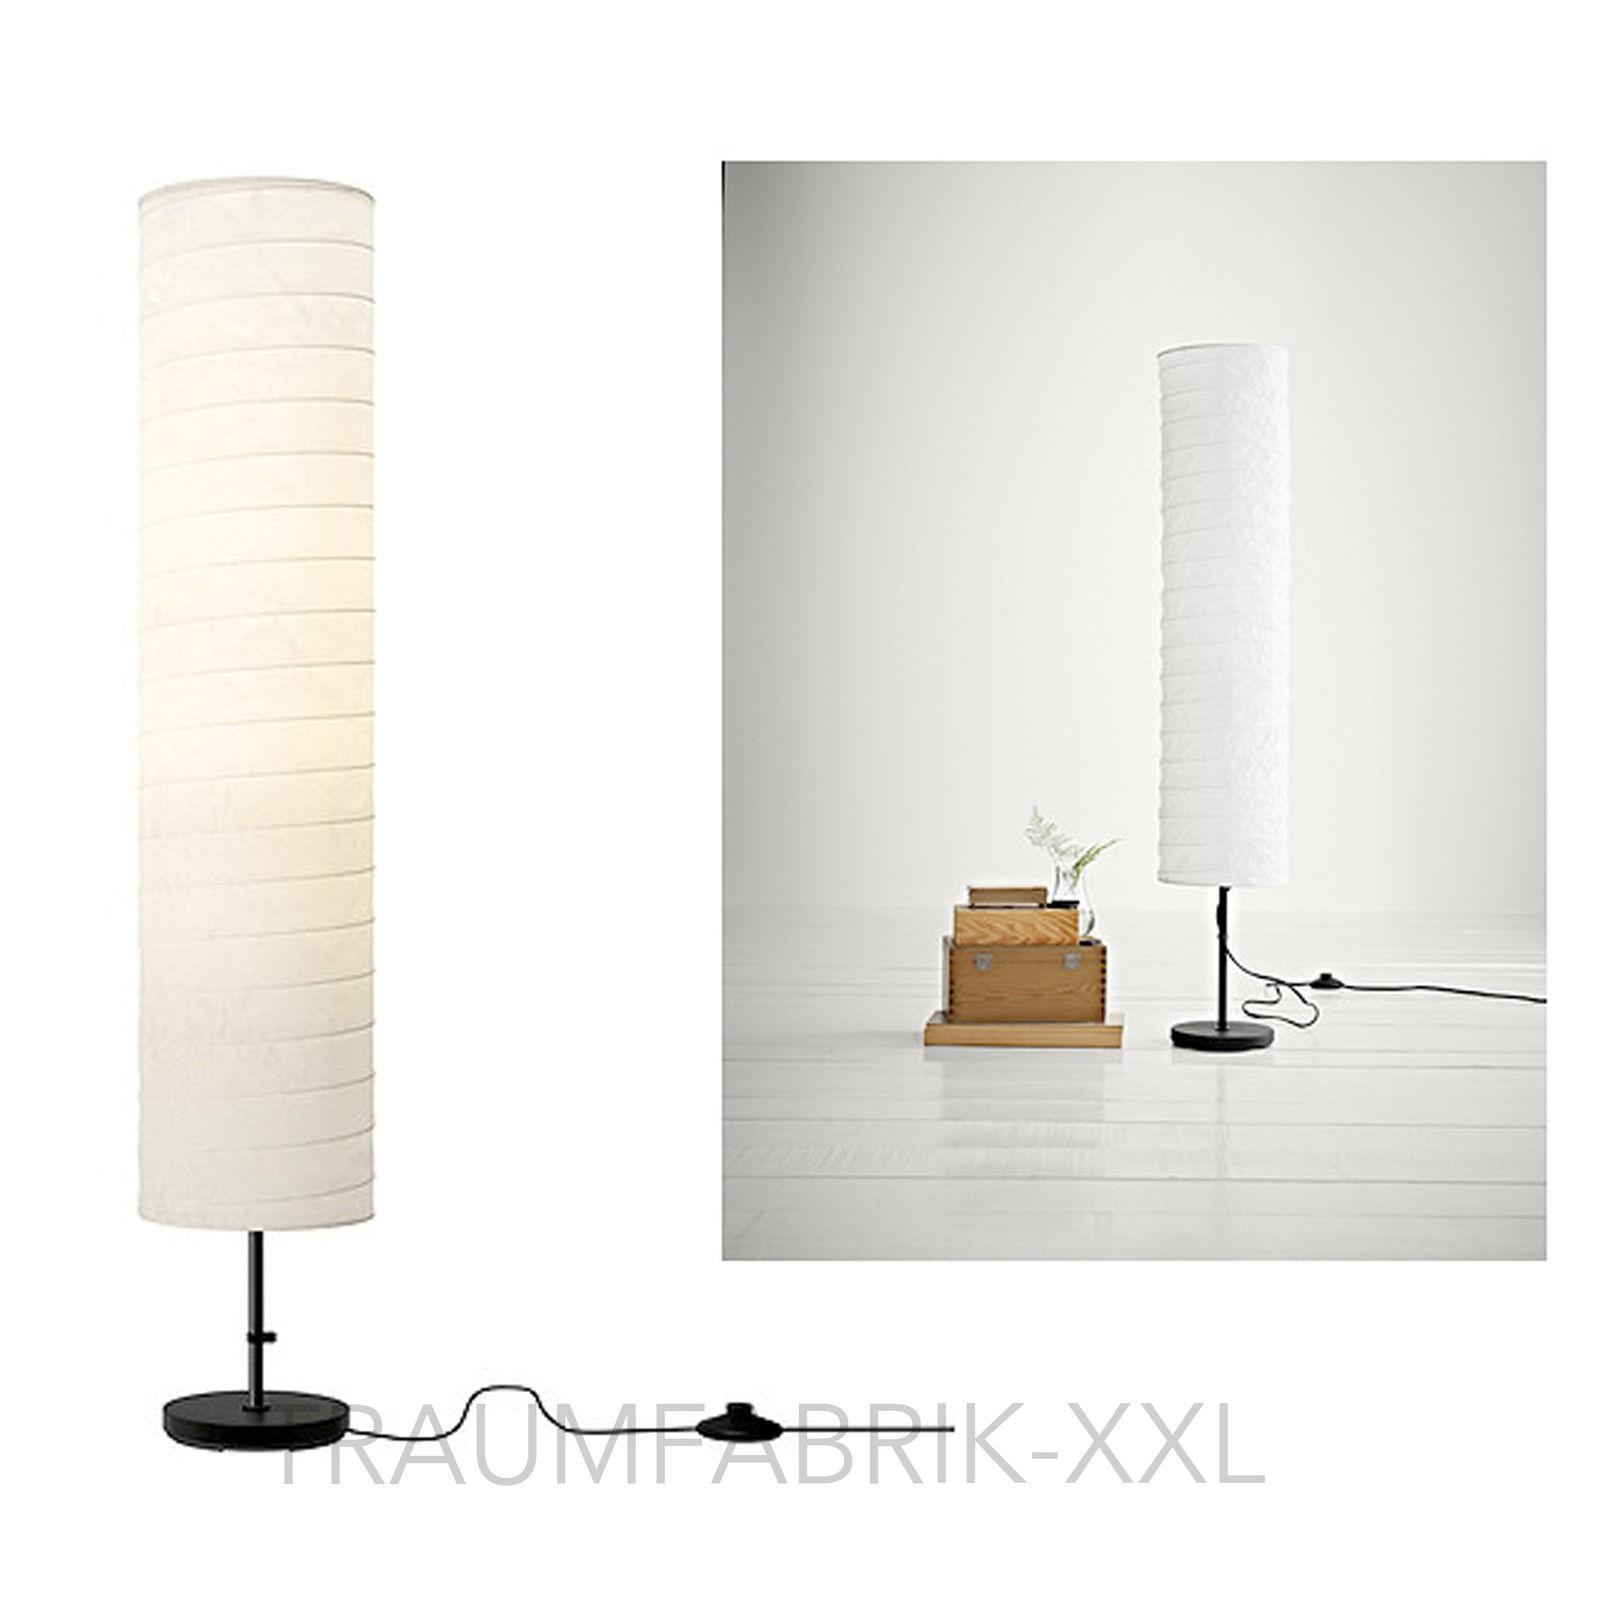 Lampenschirm Stehlampe Ikea Lampenschirm Stehlampe T Rkis